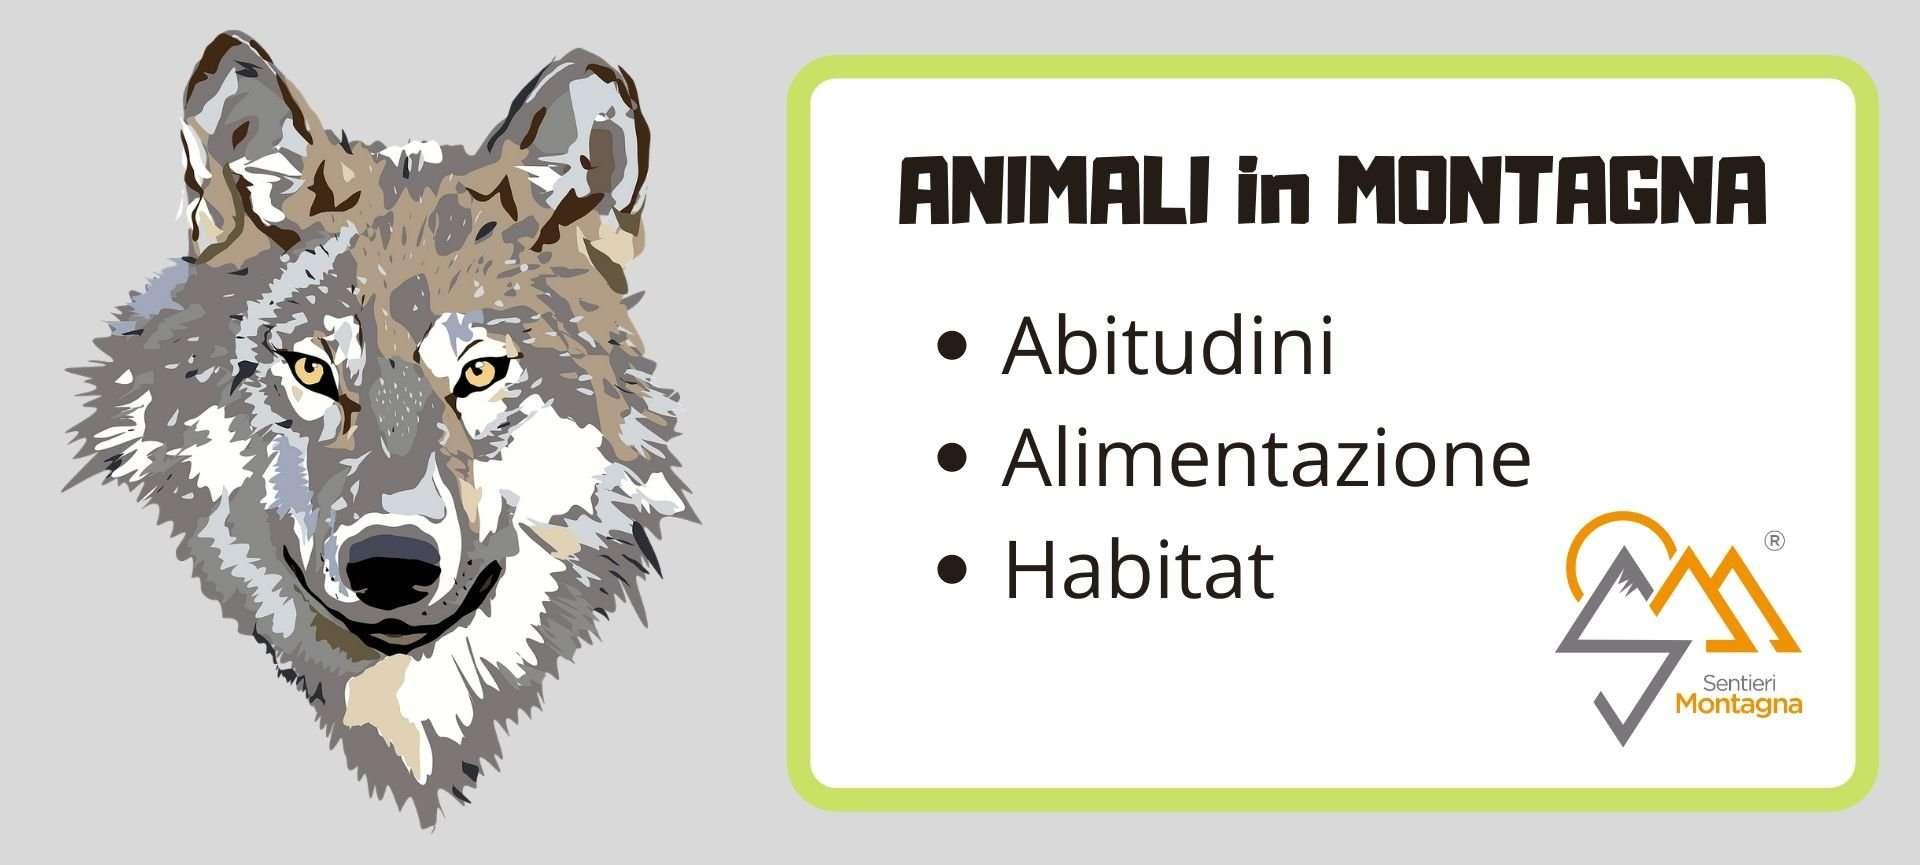 riconoscimento impronte animali